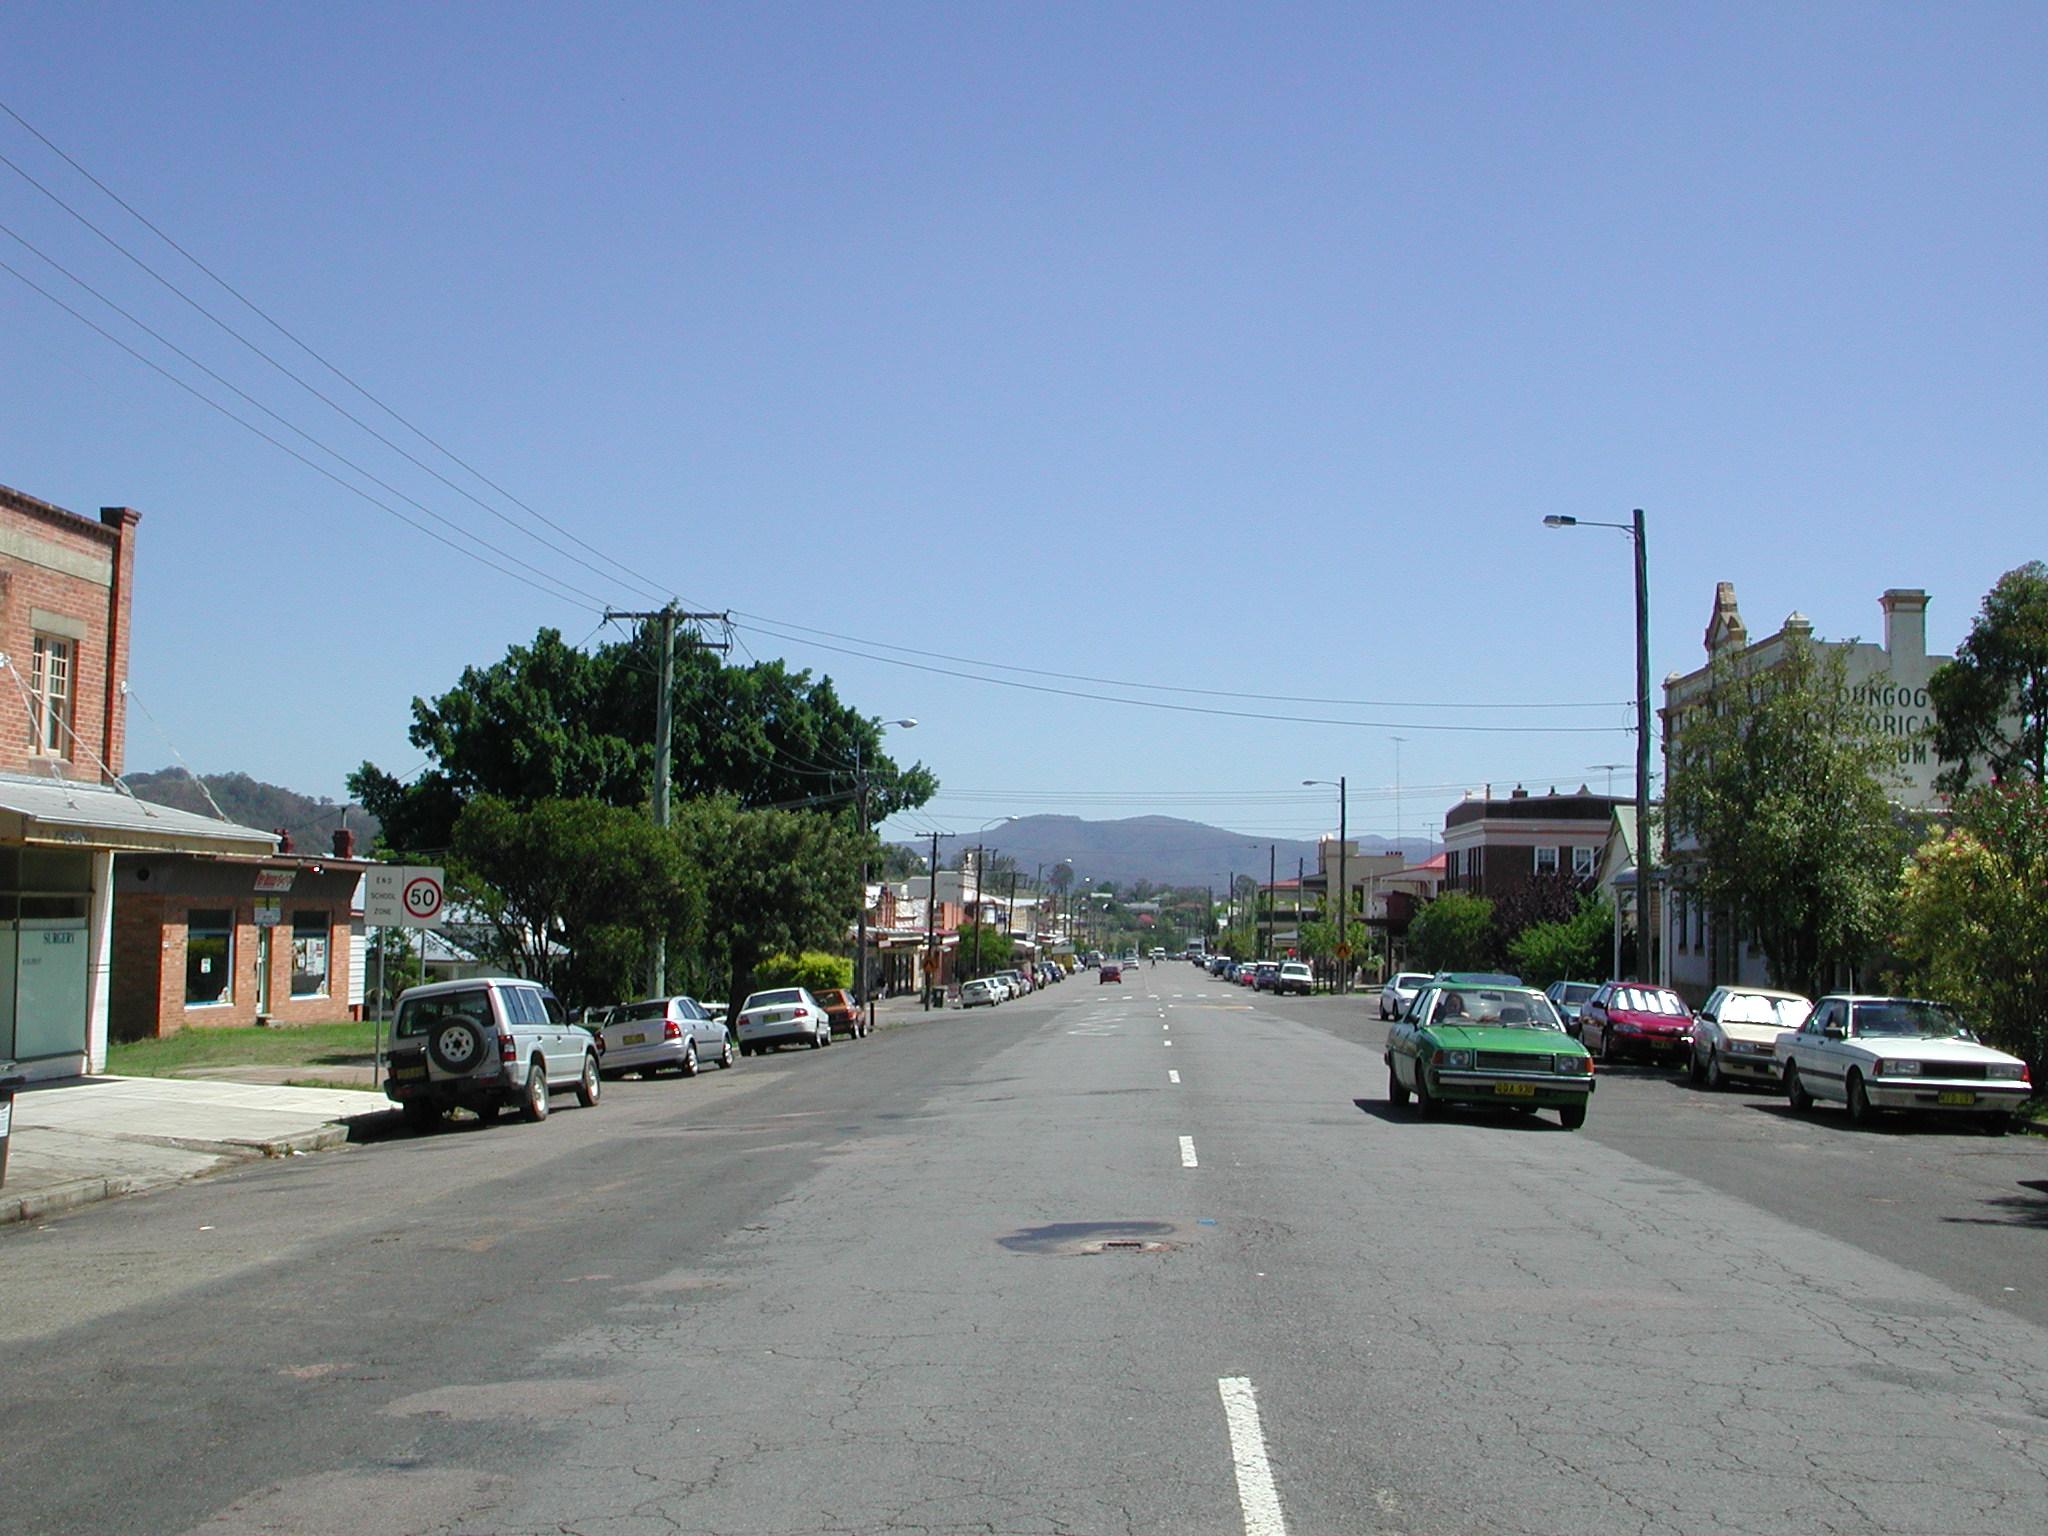 Main St 04, Dungog.jpg